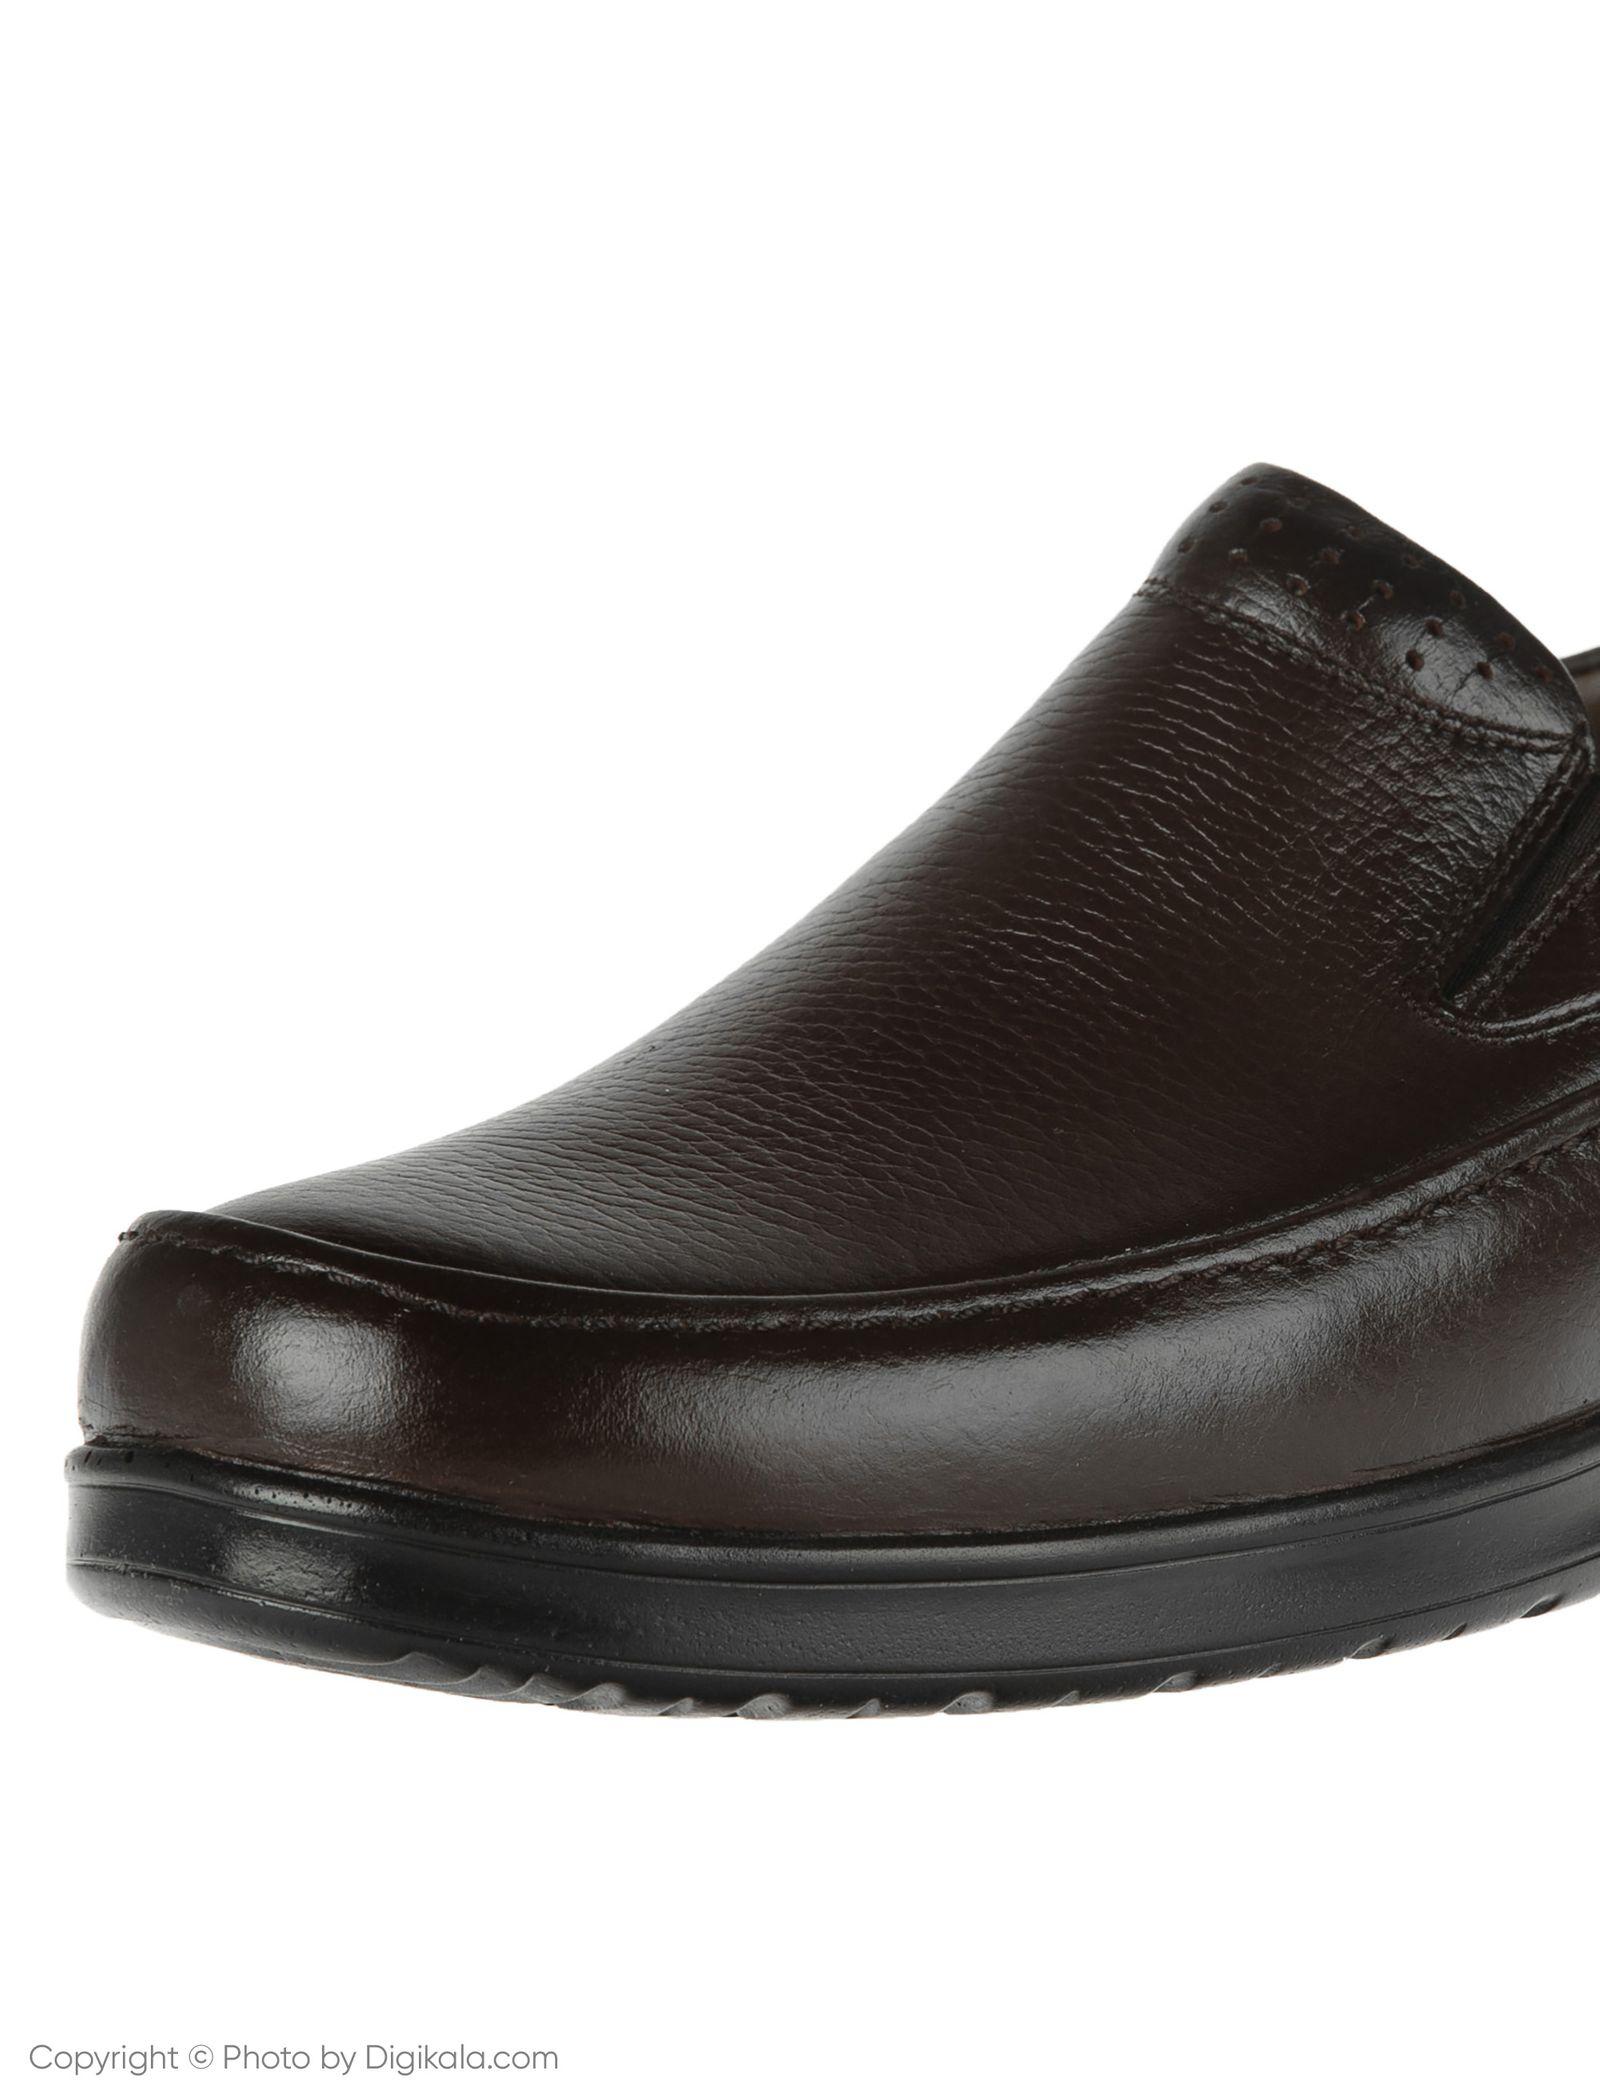 کفش روزمره مردانه ساتین مدل SN7172A-104 -  - 6